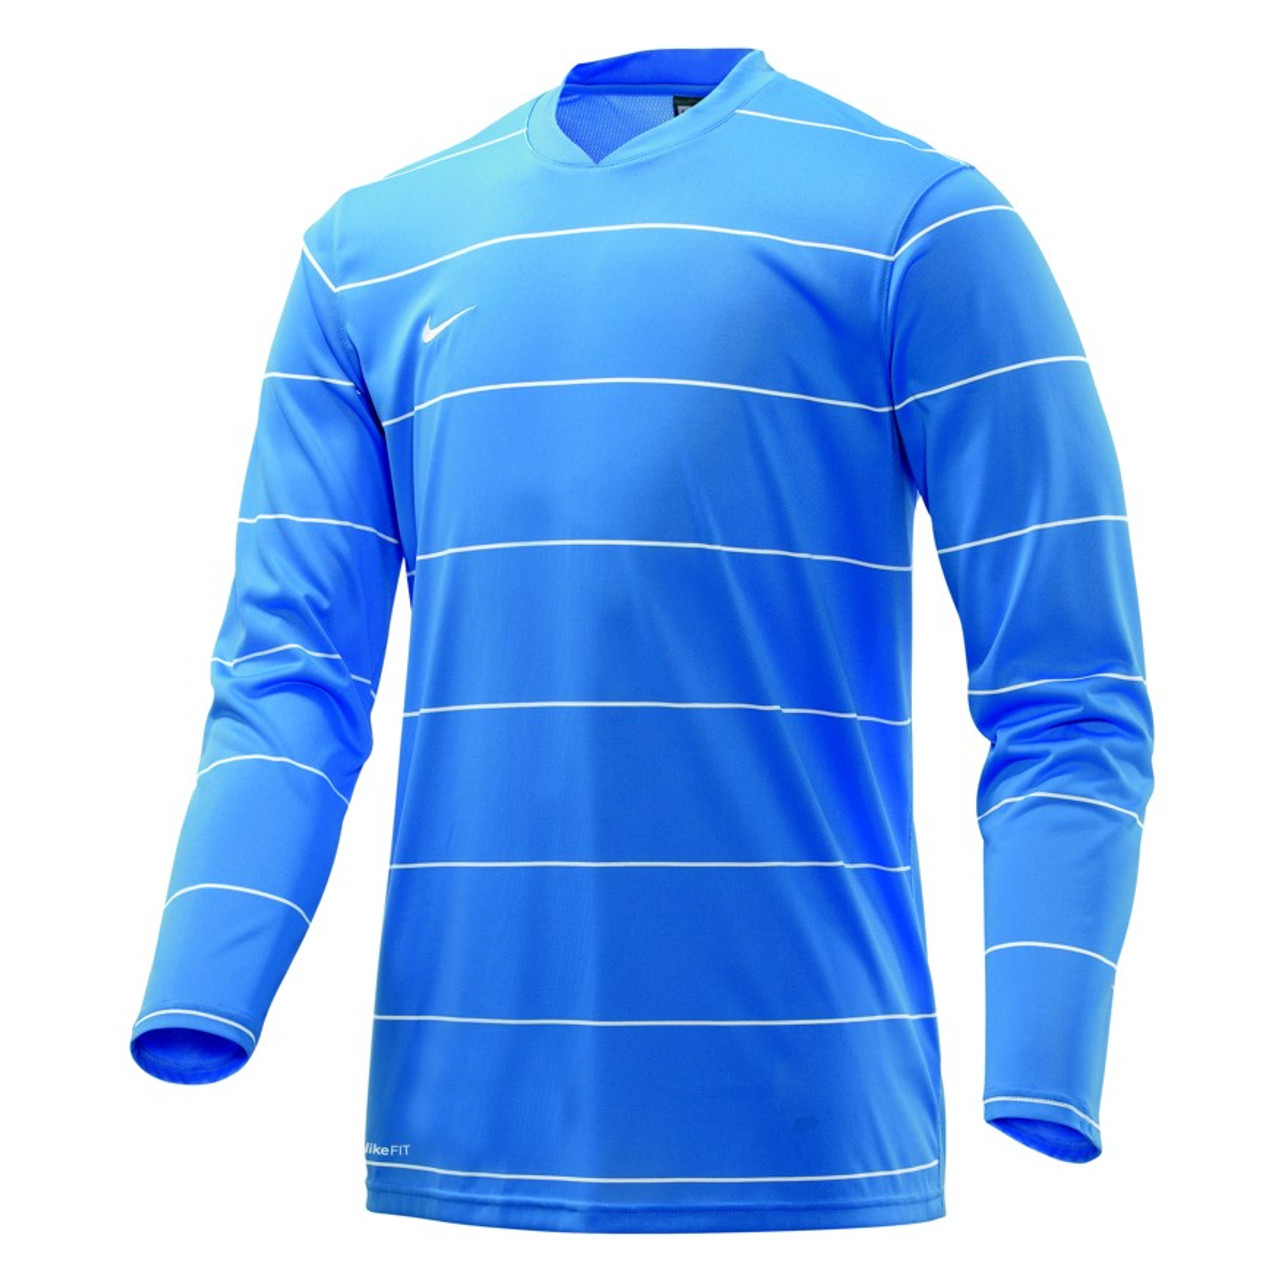 2b5af427 Nike Men's Pro Long Sleeve Fitted Shirt